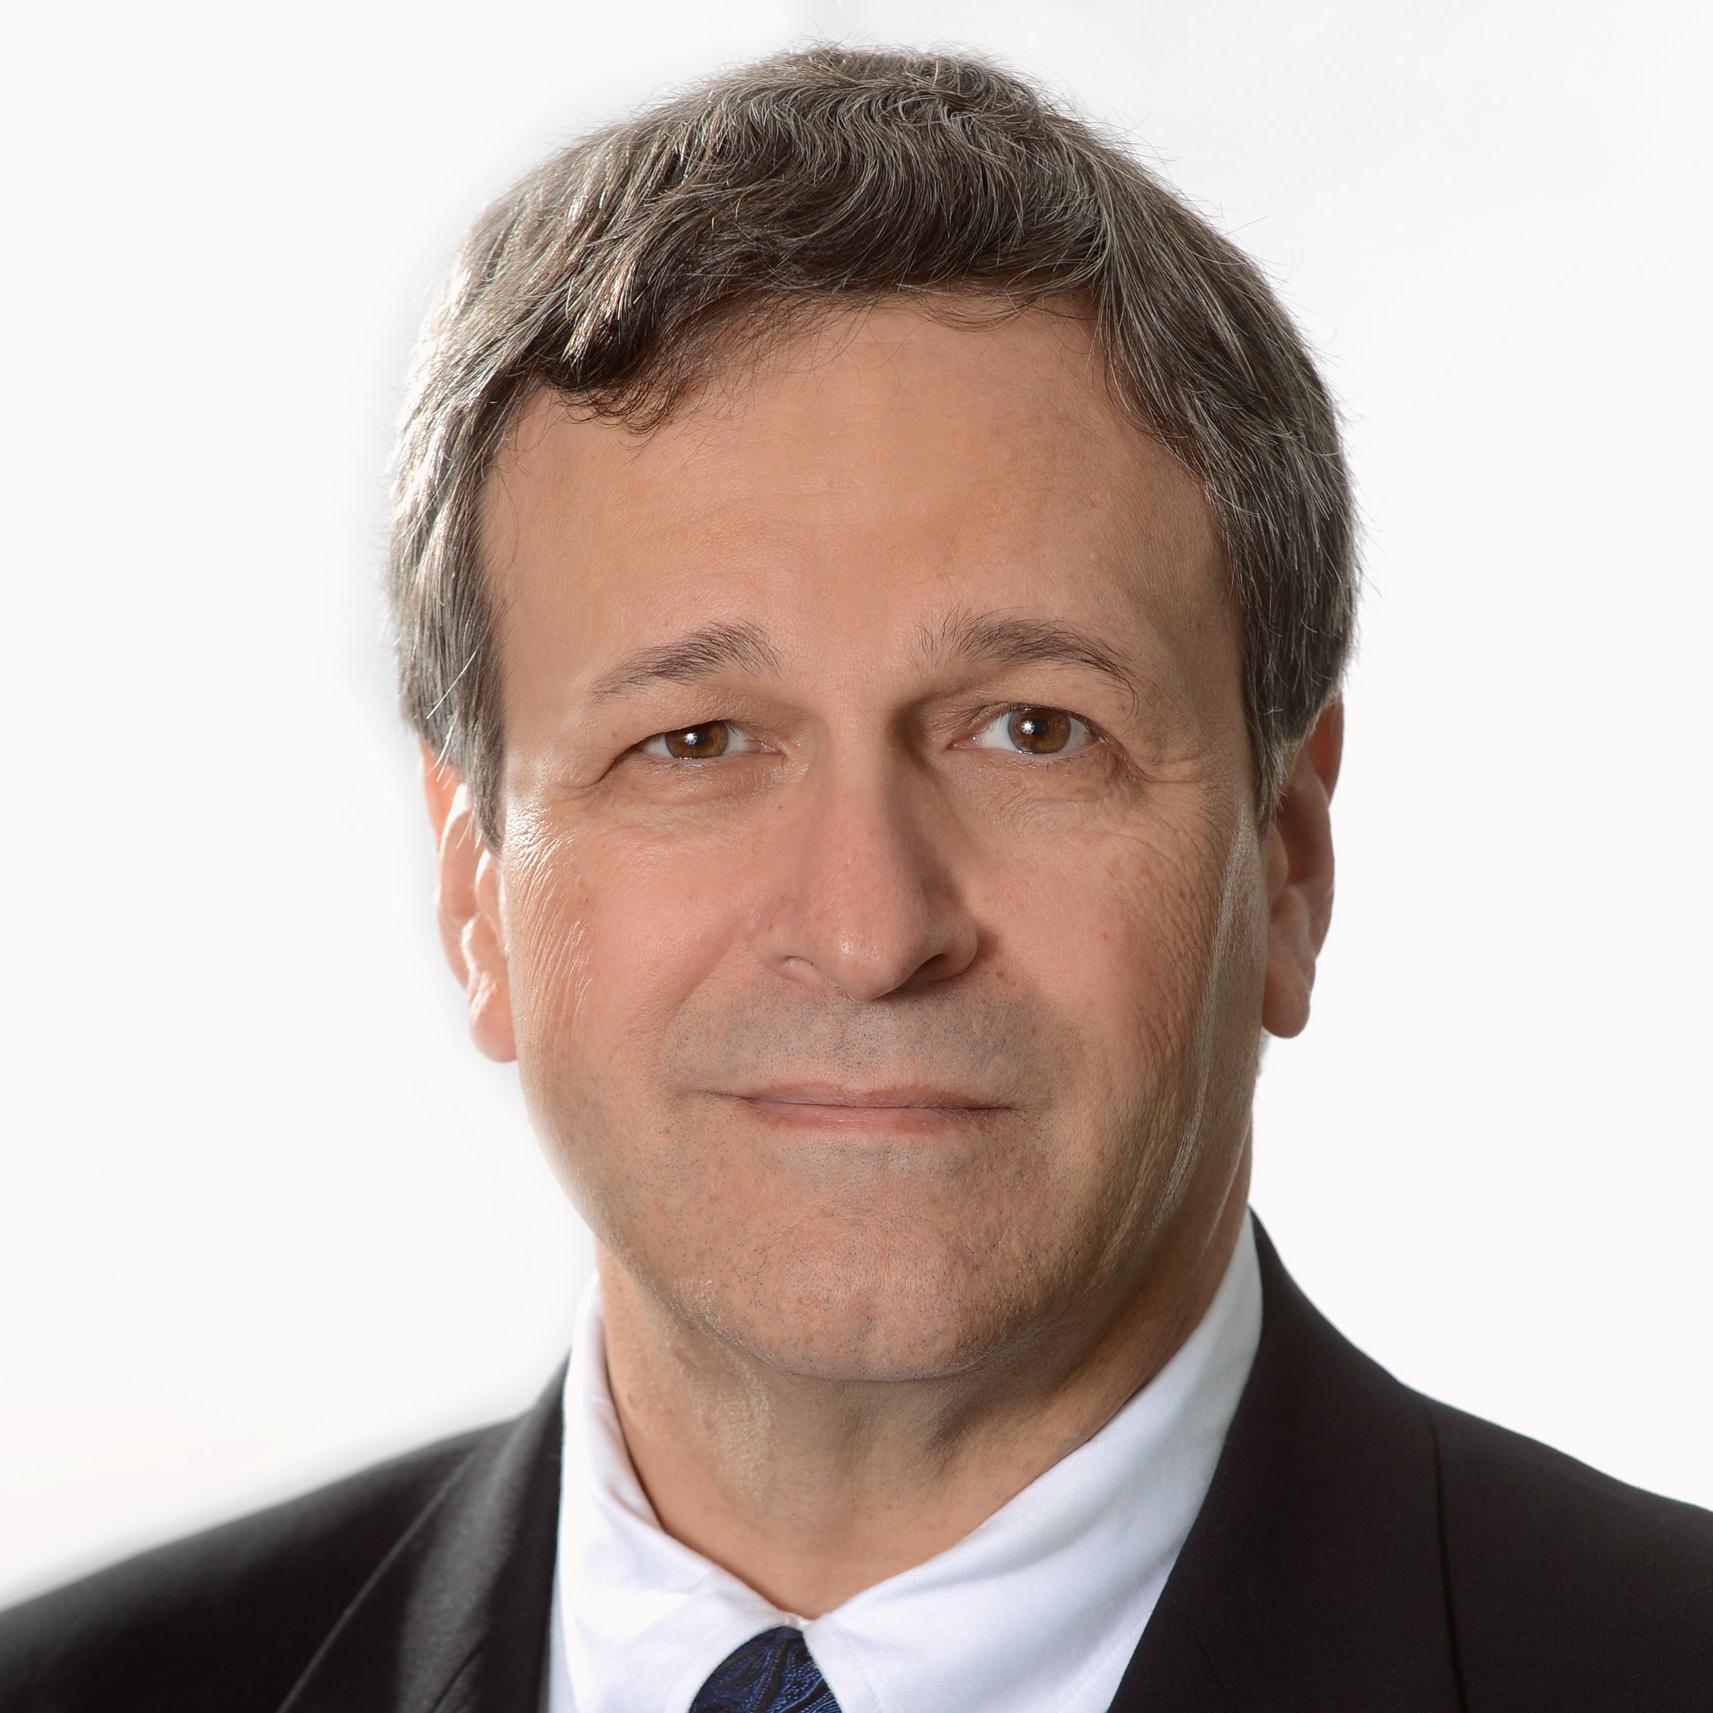 Steve Justice, Georgia Centers of Innovation